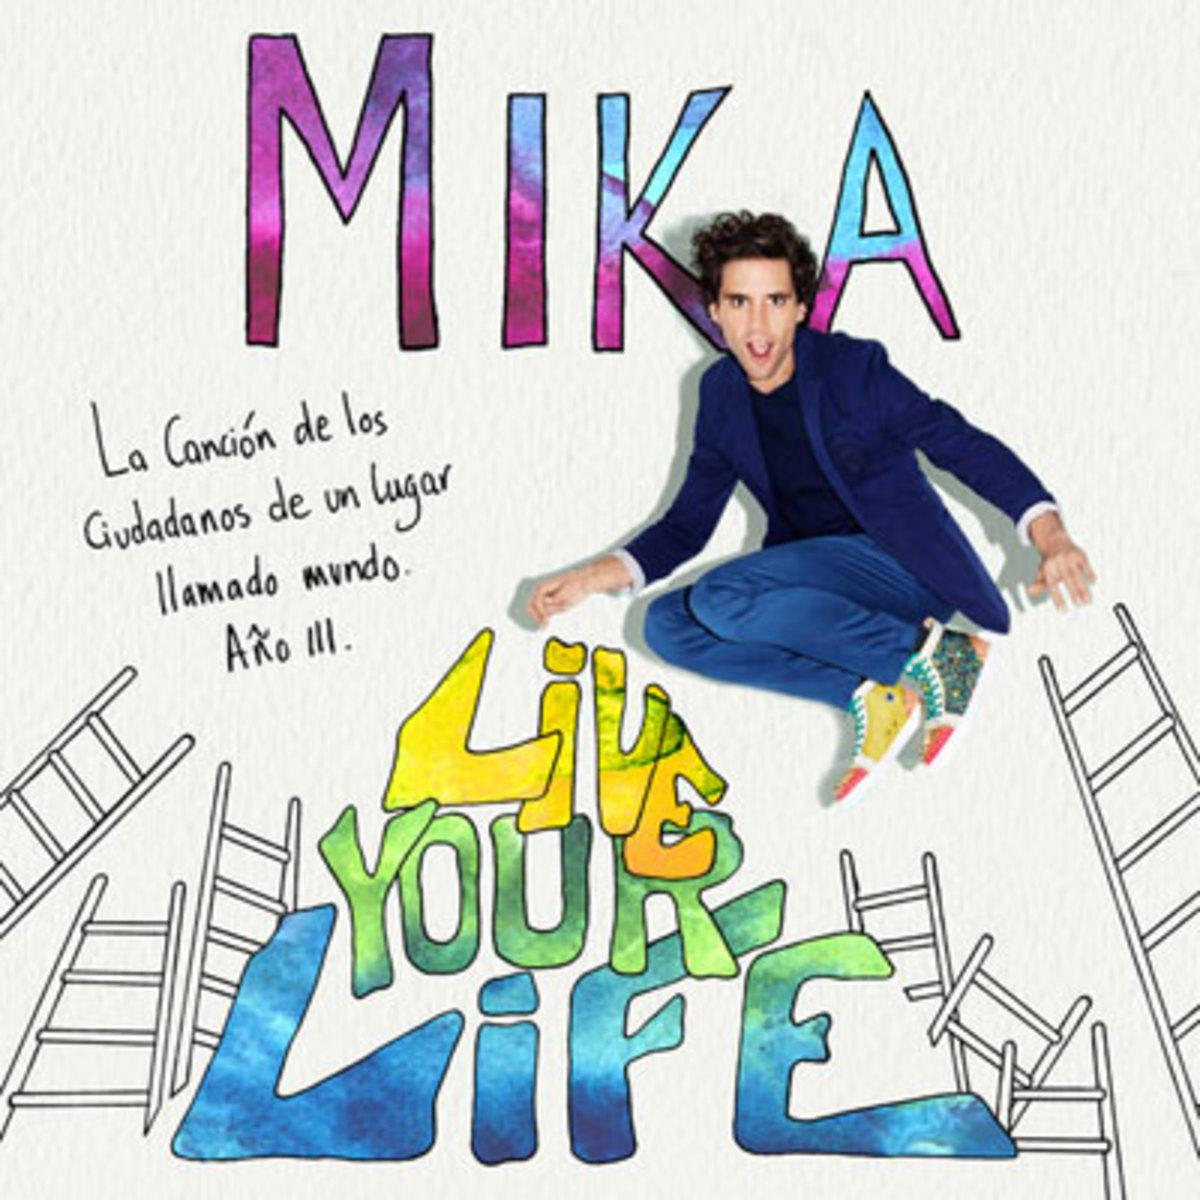 mika-liveyourlife.jpg